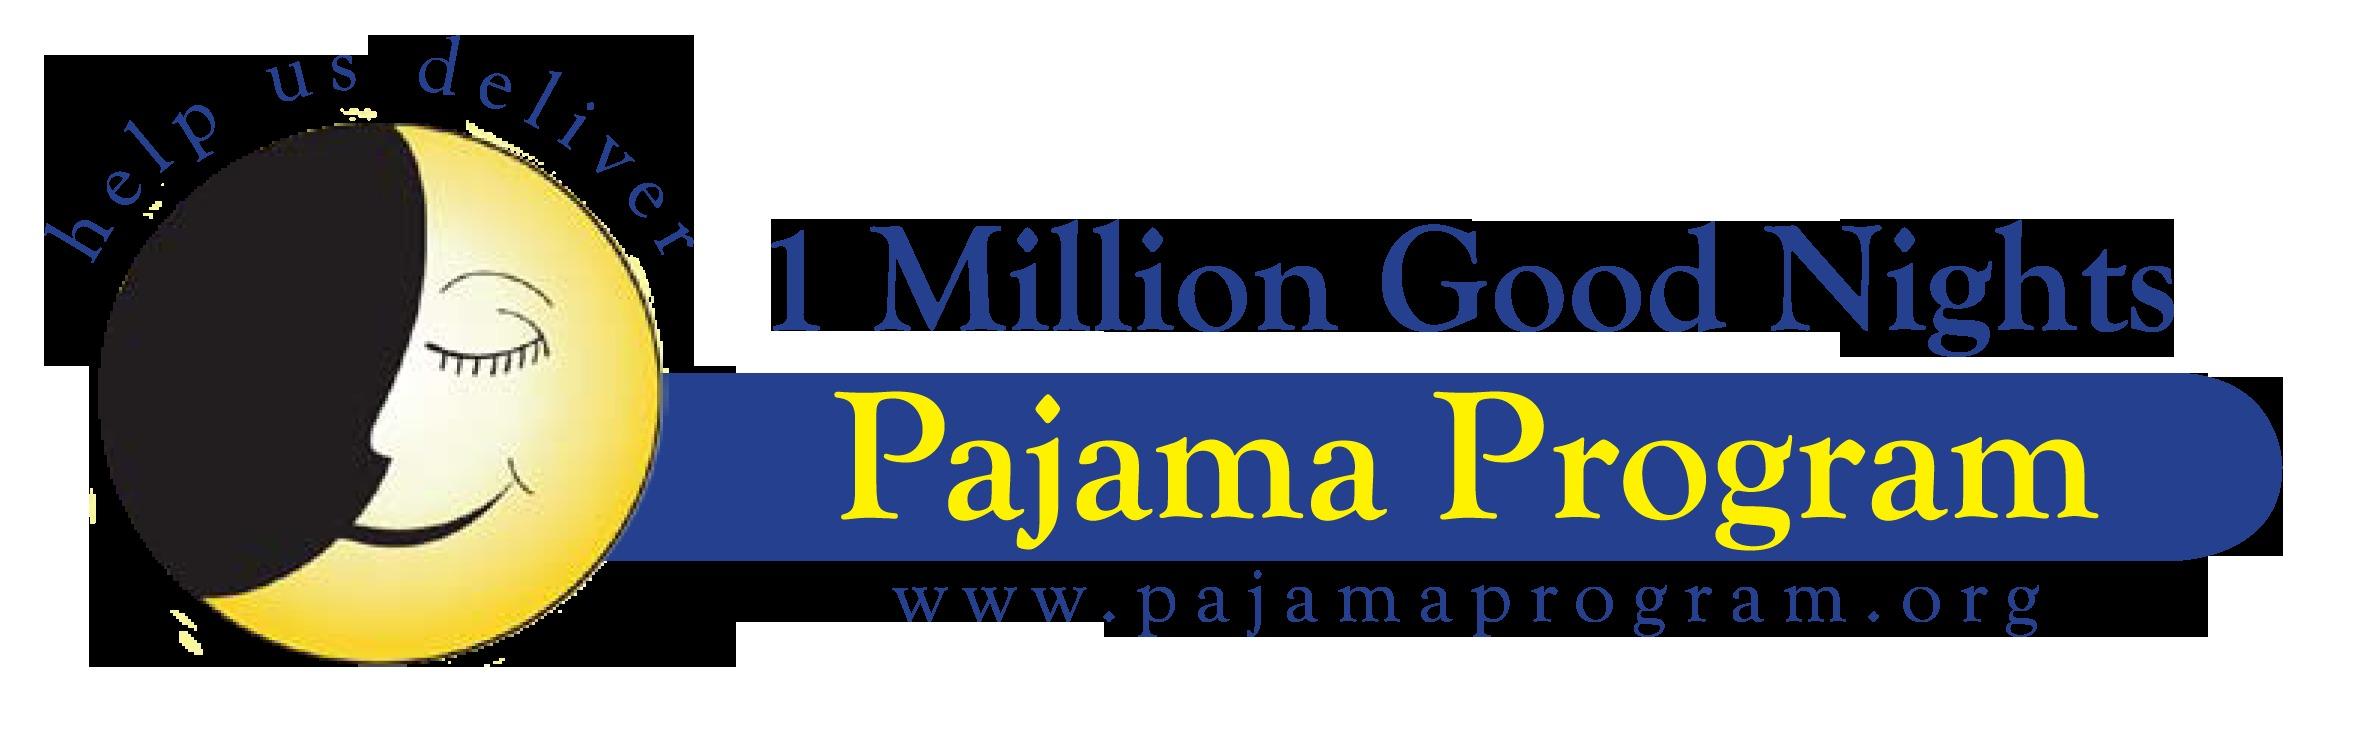 f49ca8d7437e70441439_PajamaDrop.png